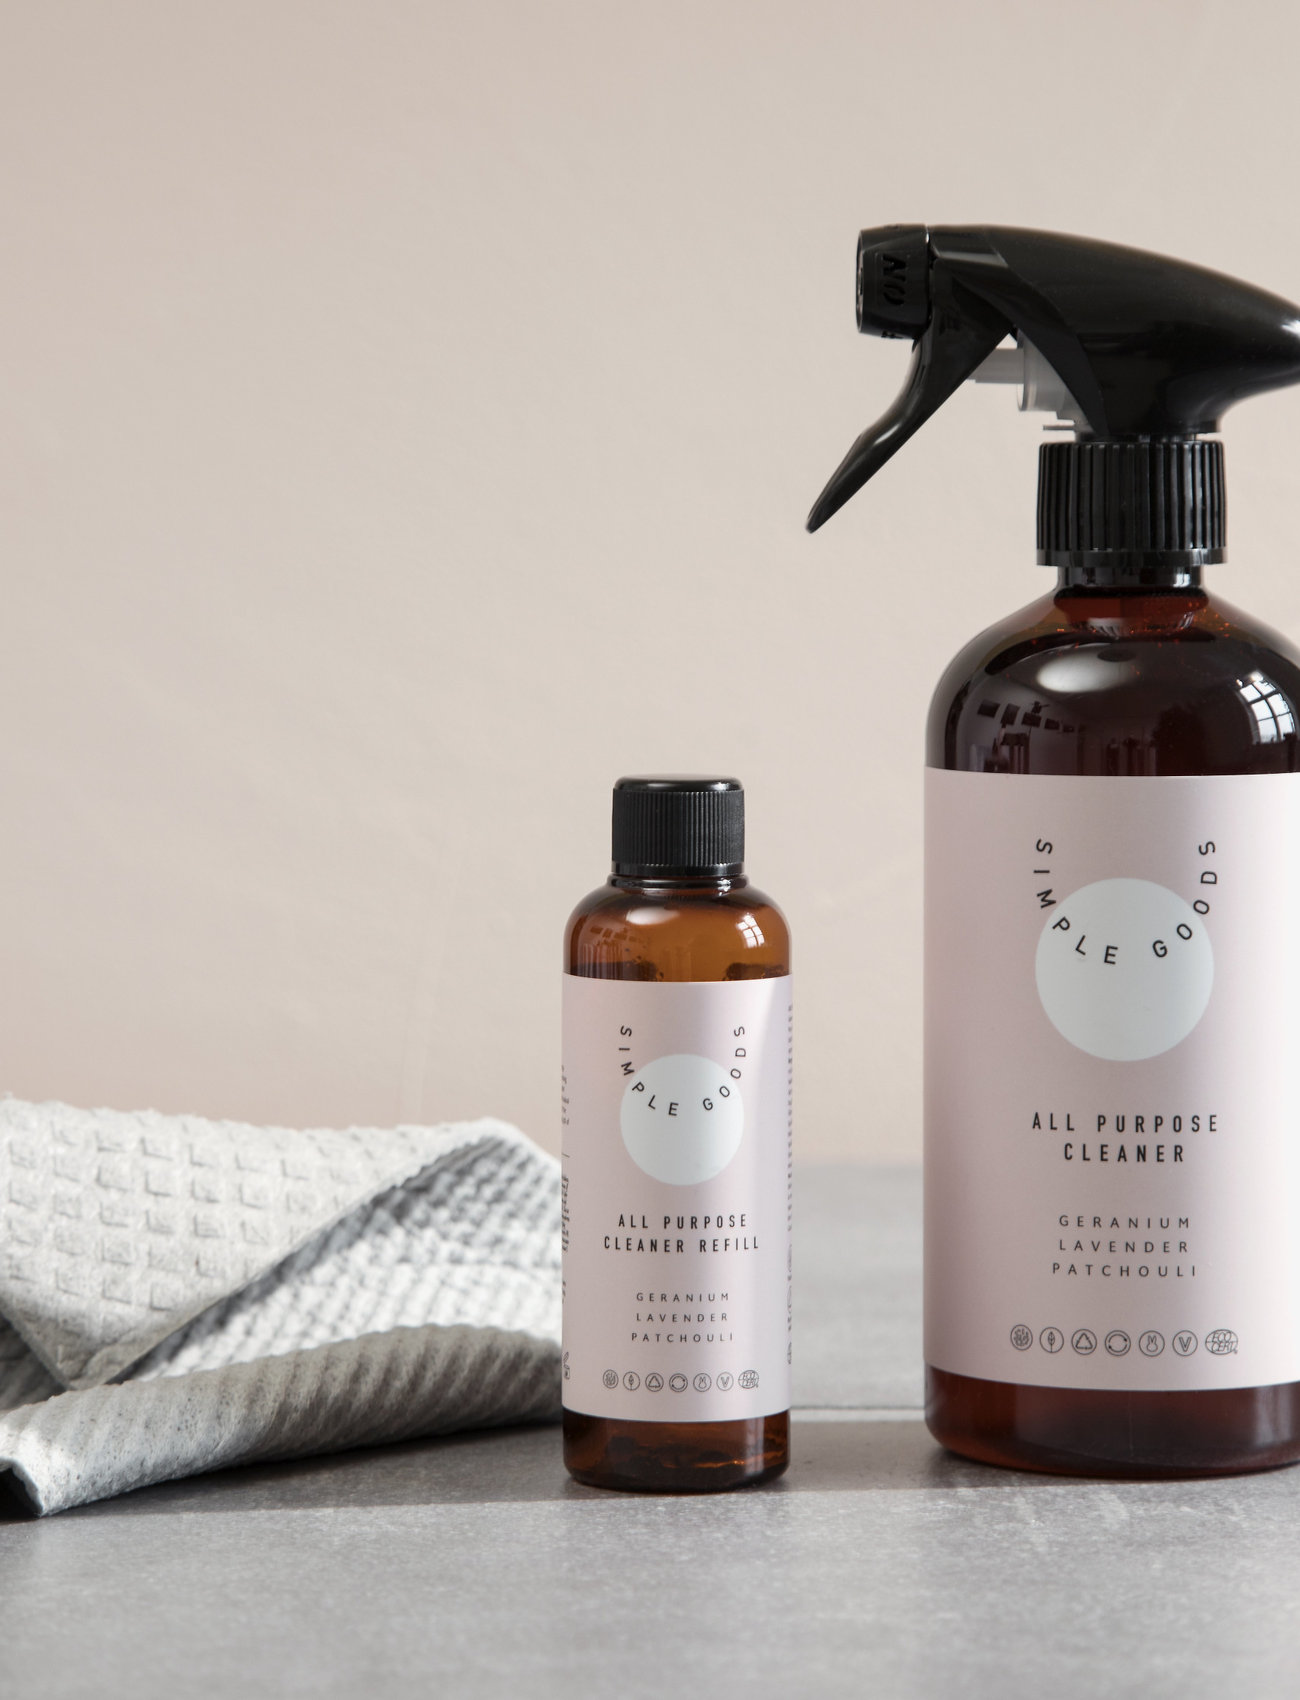 Simple Goods - Refill All Purpose Cleaner, Geranium, Lavender, Patchouli - Övrigt diskning & städning - clear - 1